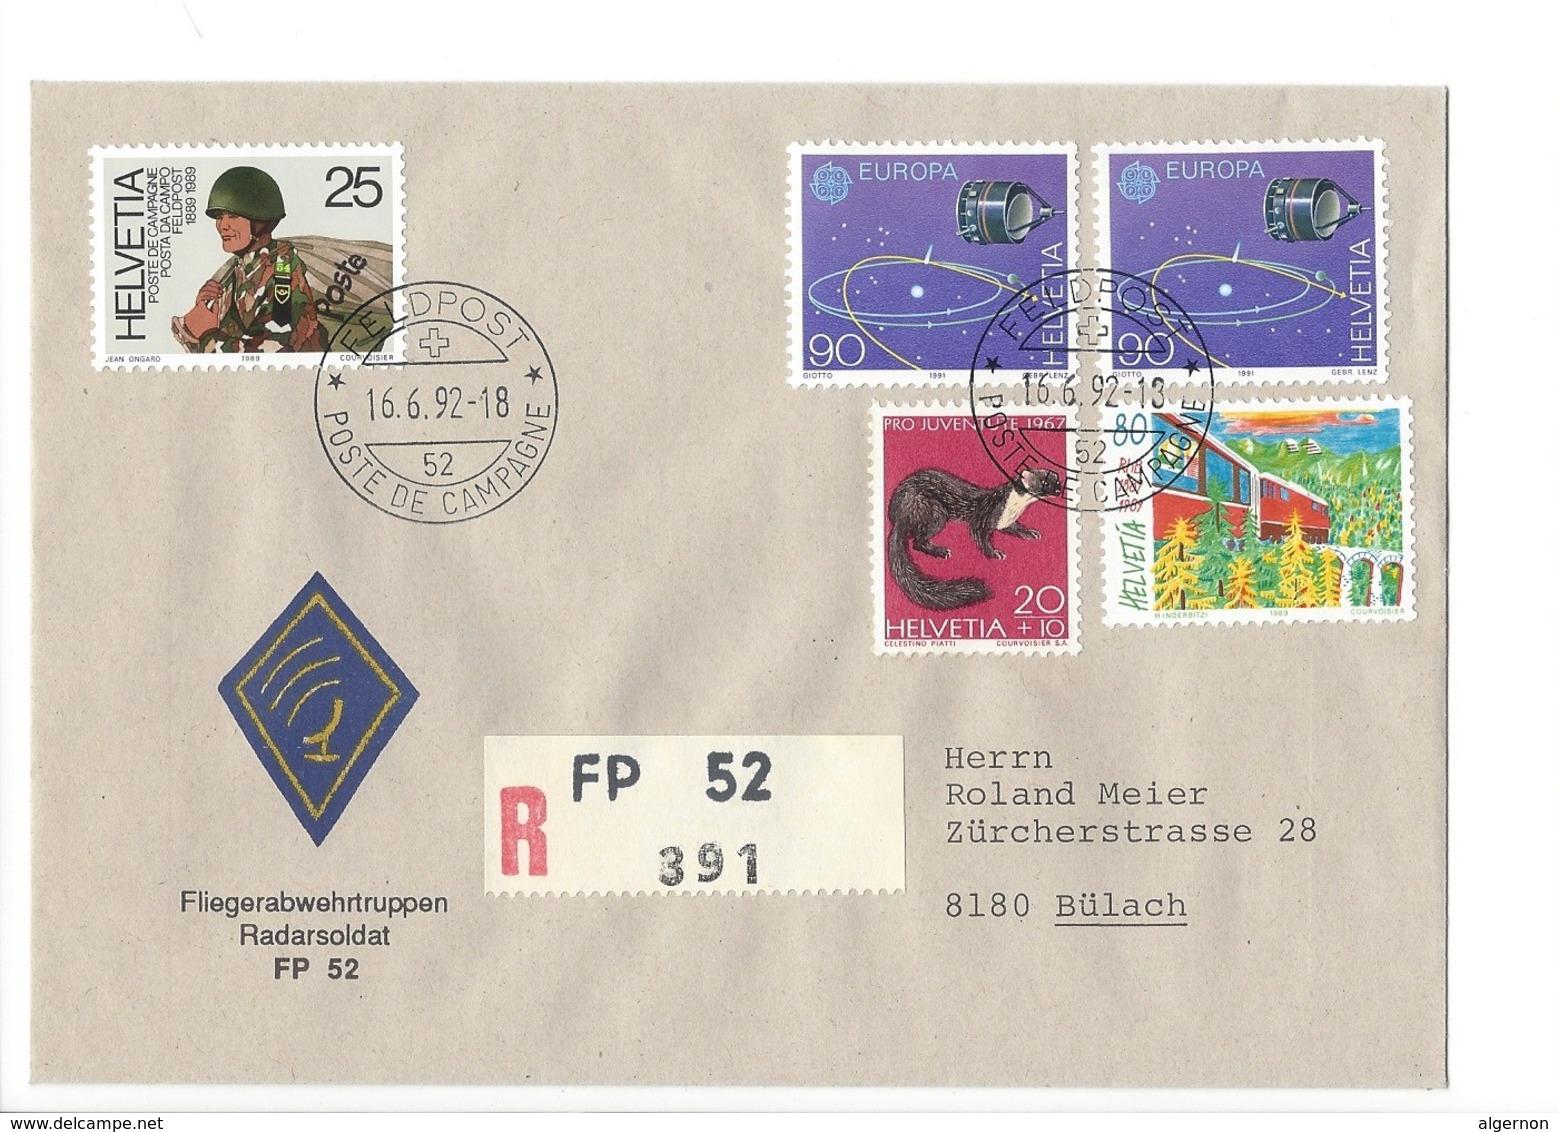 21166 - Militaria Suisse  Cover Feldpost Radarsoldat FP 52 R 391 Pour 8180 Bülach 16.06.1992 - Suisse